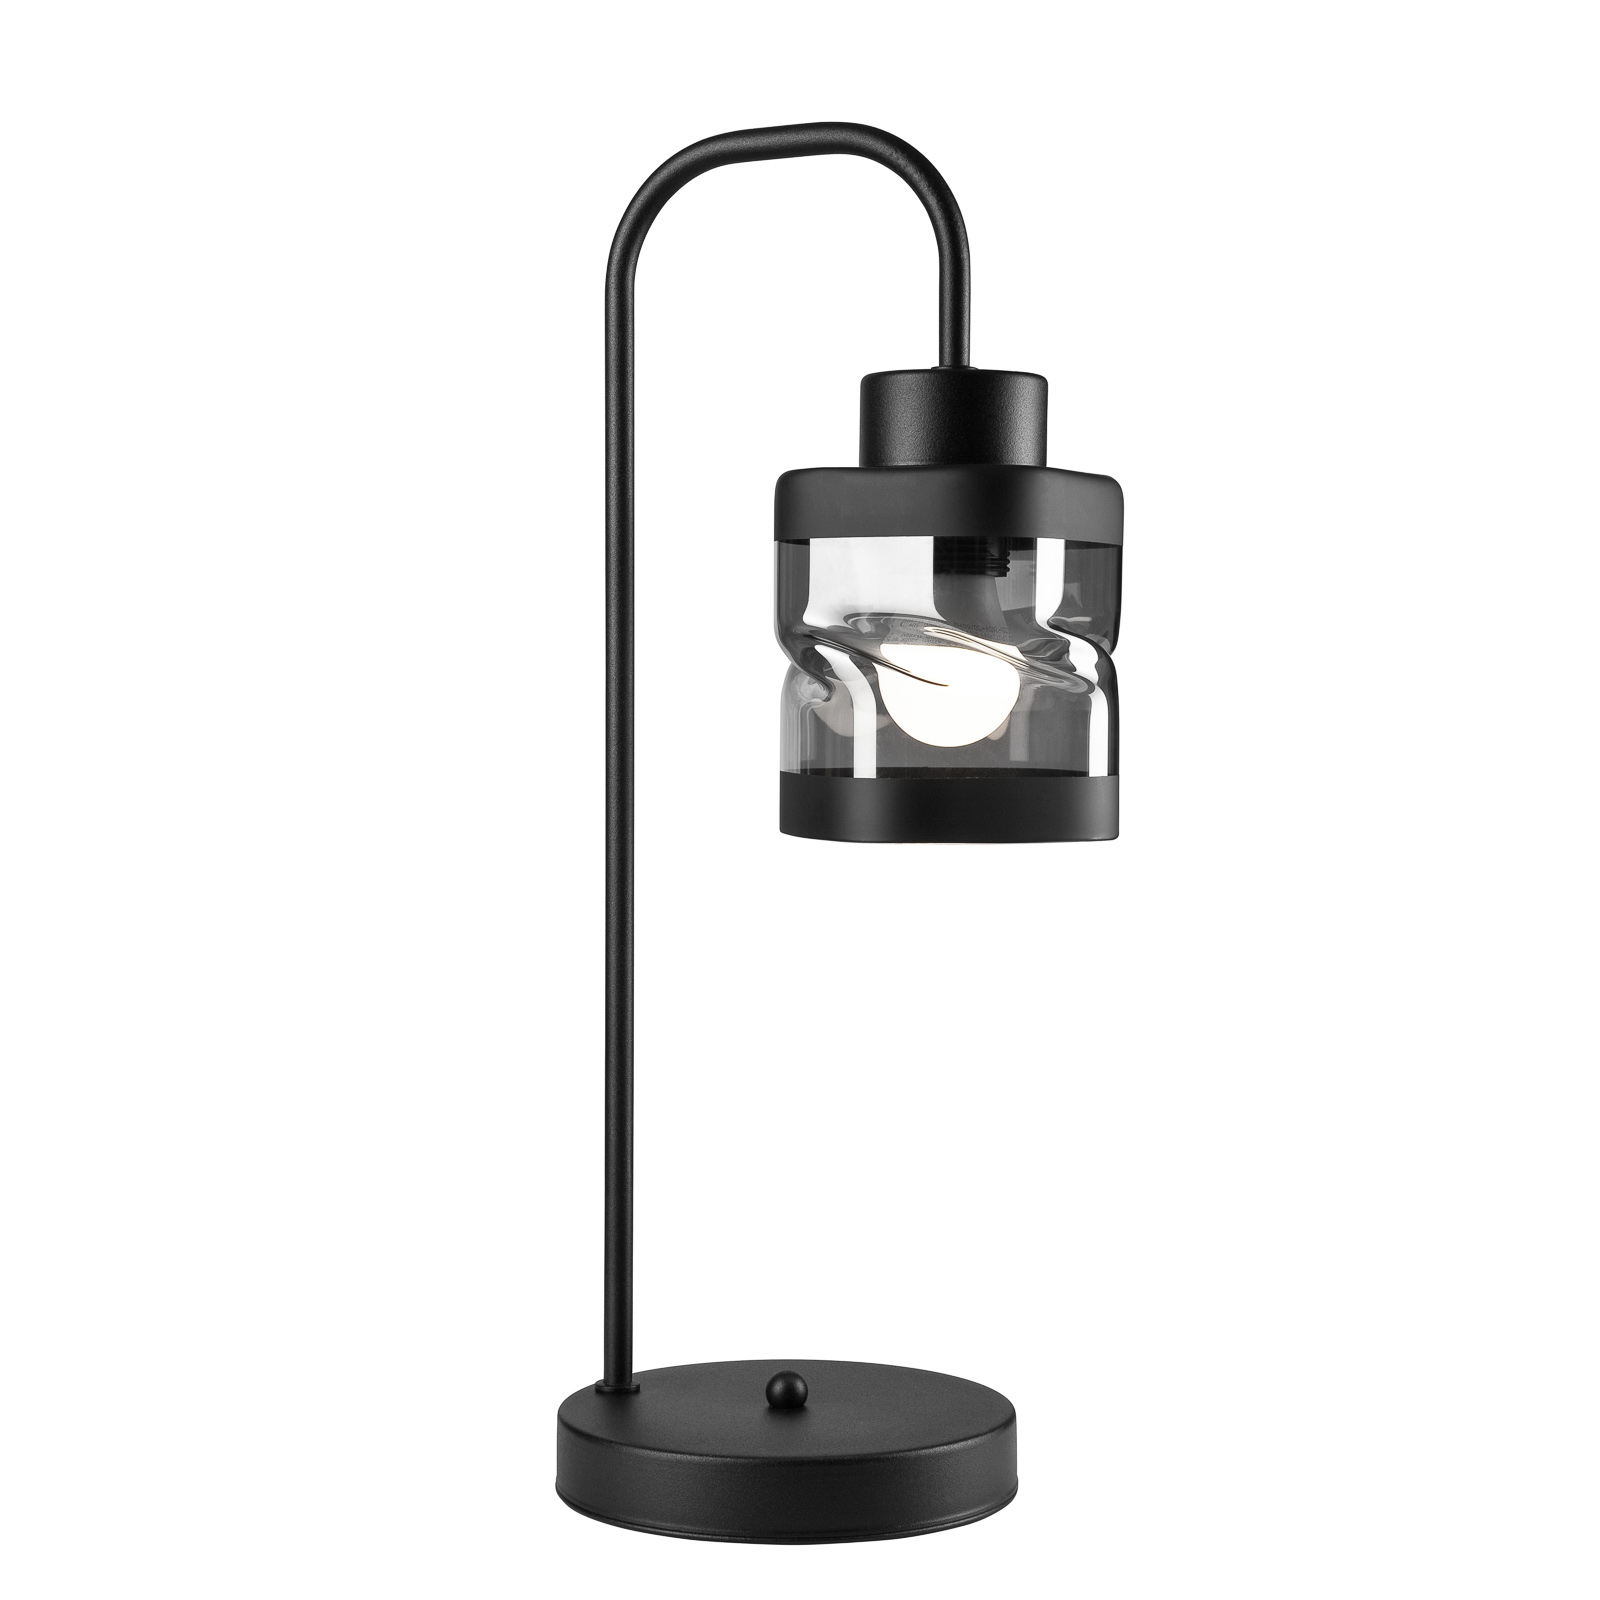 Lampa stołowa Thor kształt latarni z metalu